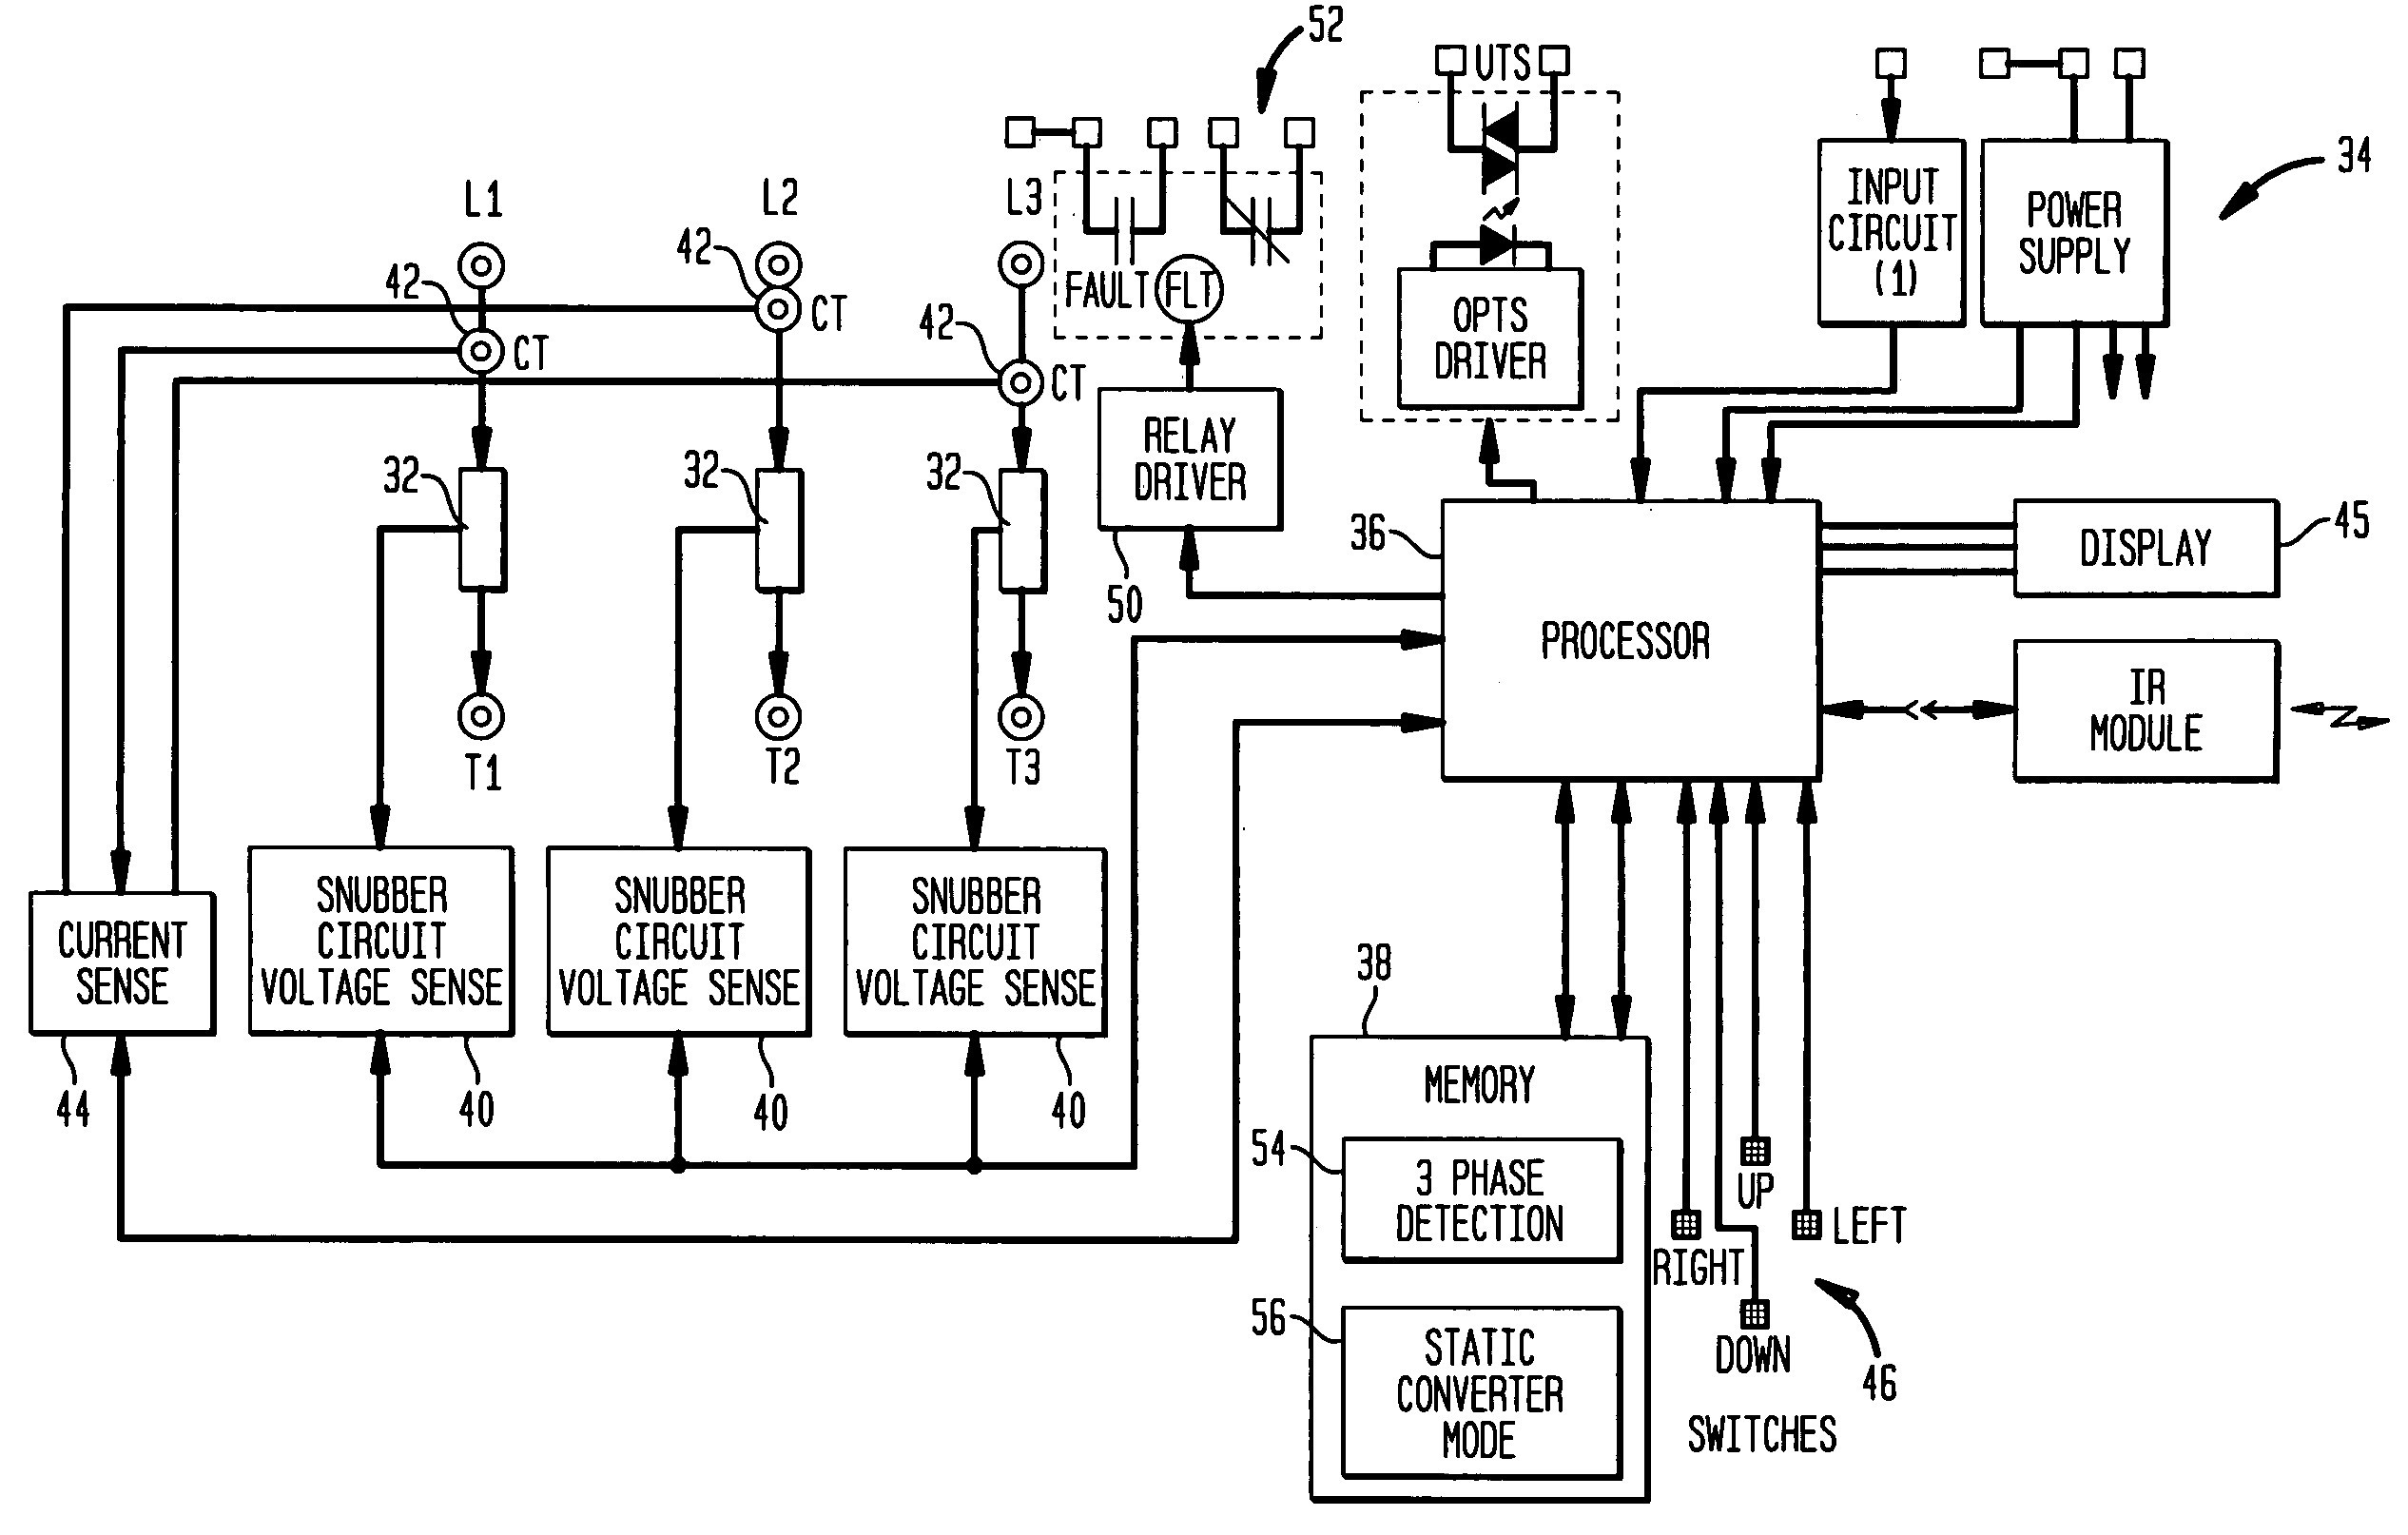 wiring diagram electric motor starter circuit best striking 3 phase rh deconstructmyhouse org